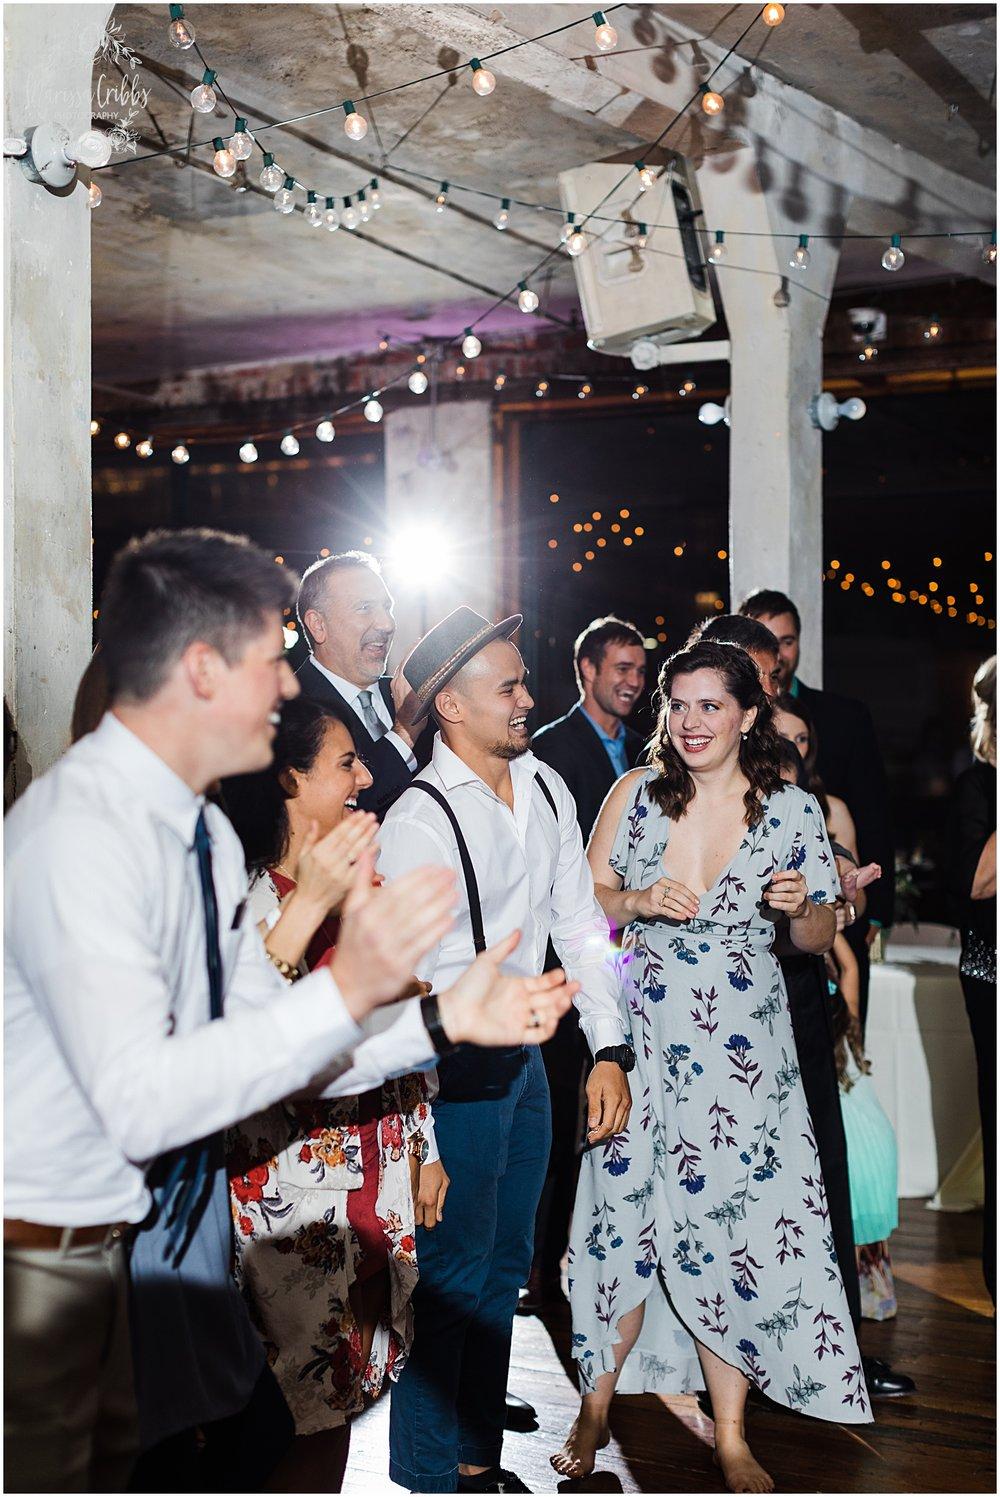 BAUER WEDDING | KELSEA & JUSTIN | MARISSA CRIBBS PHOTOGRAPHY_6612.jpg